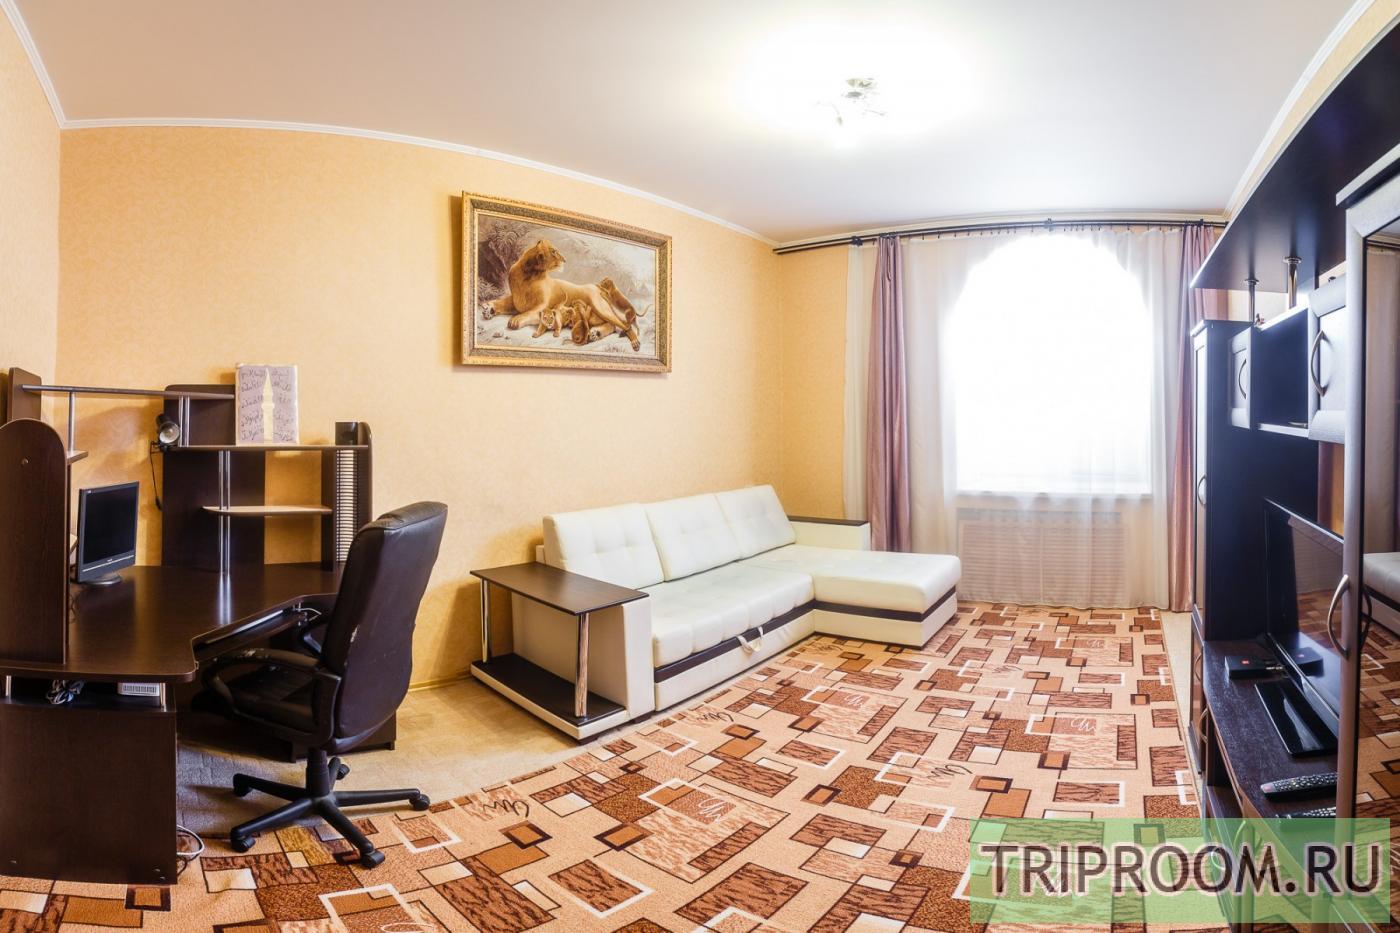 3-комнатная квартира посуточно (вариант № 15948), ул. Назарбаева улица, фото № 11